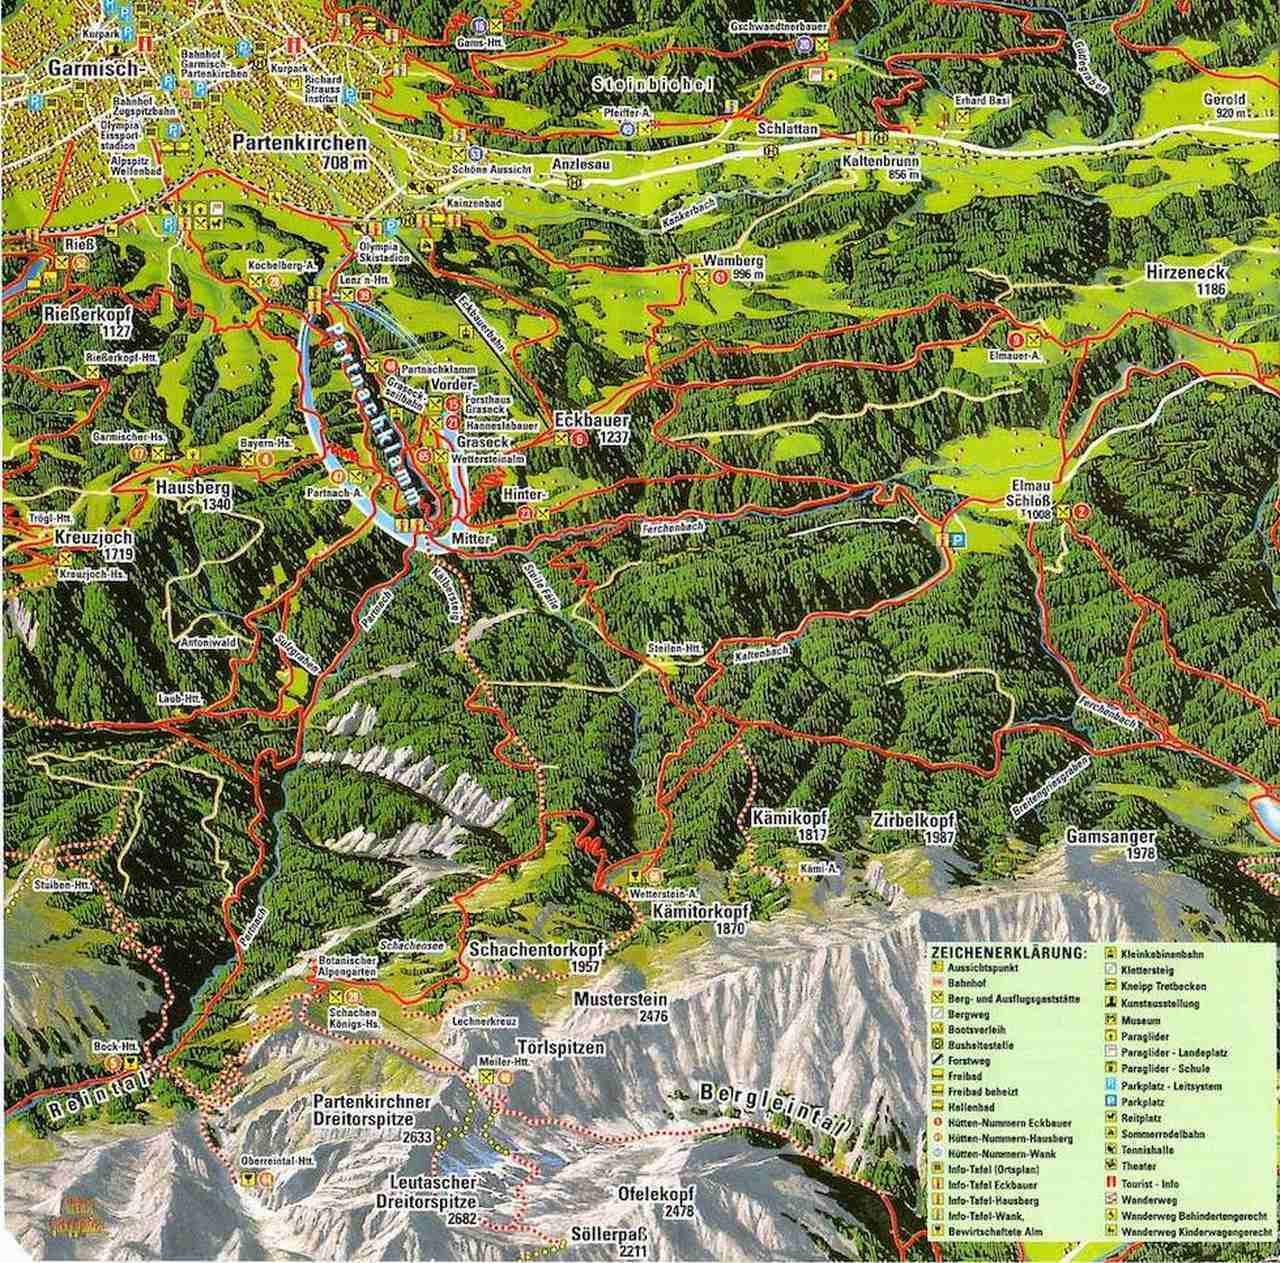 Partnachklamm Wanderungen - Garmisch-Partenkirchen, Bayern